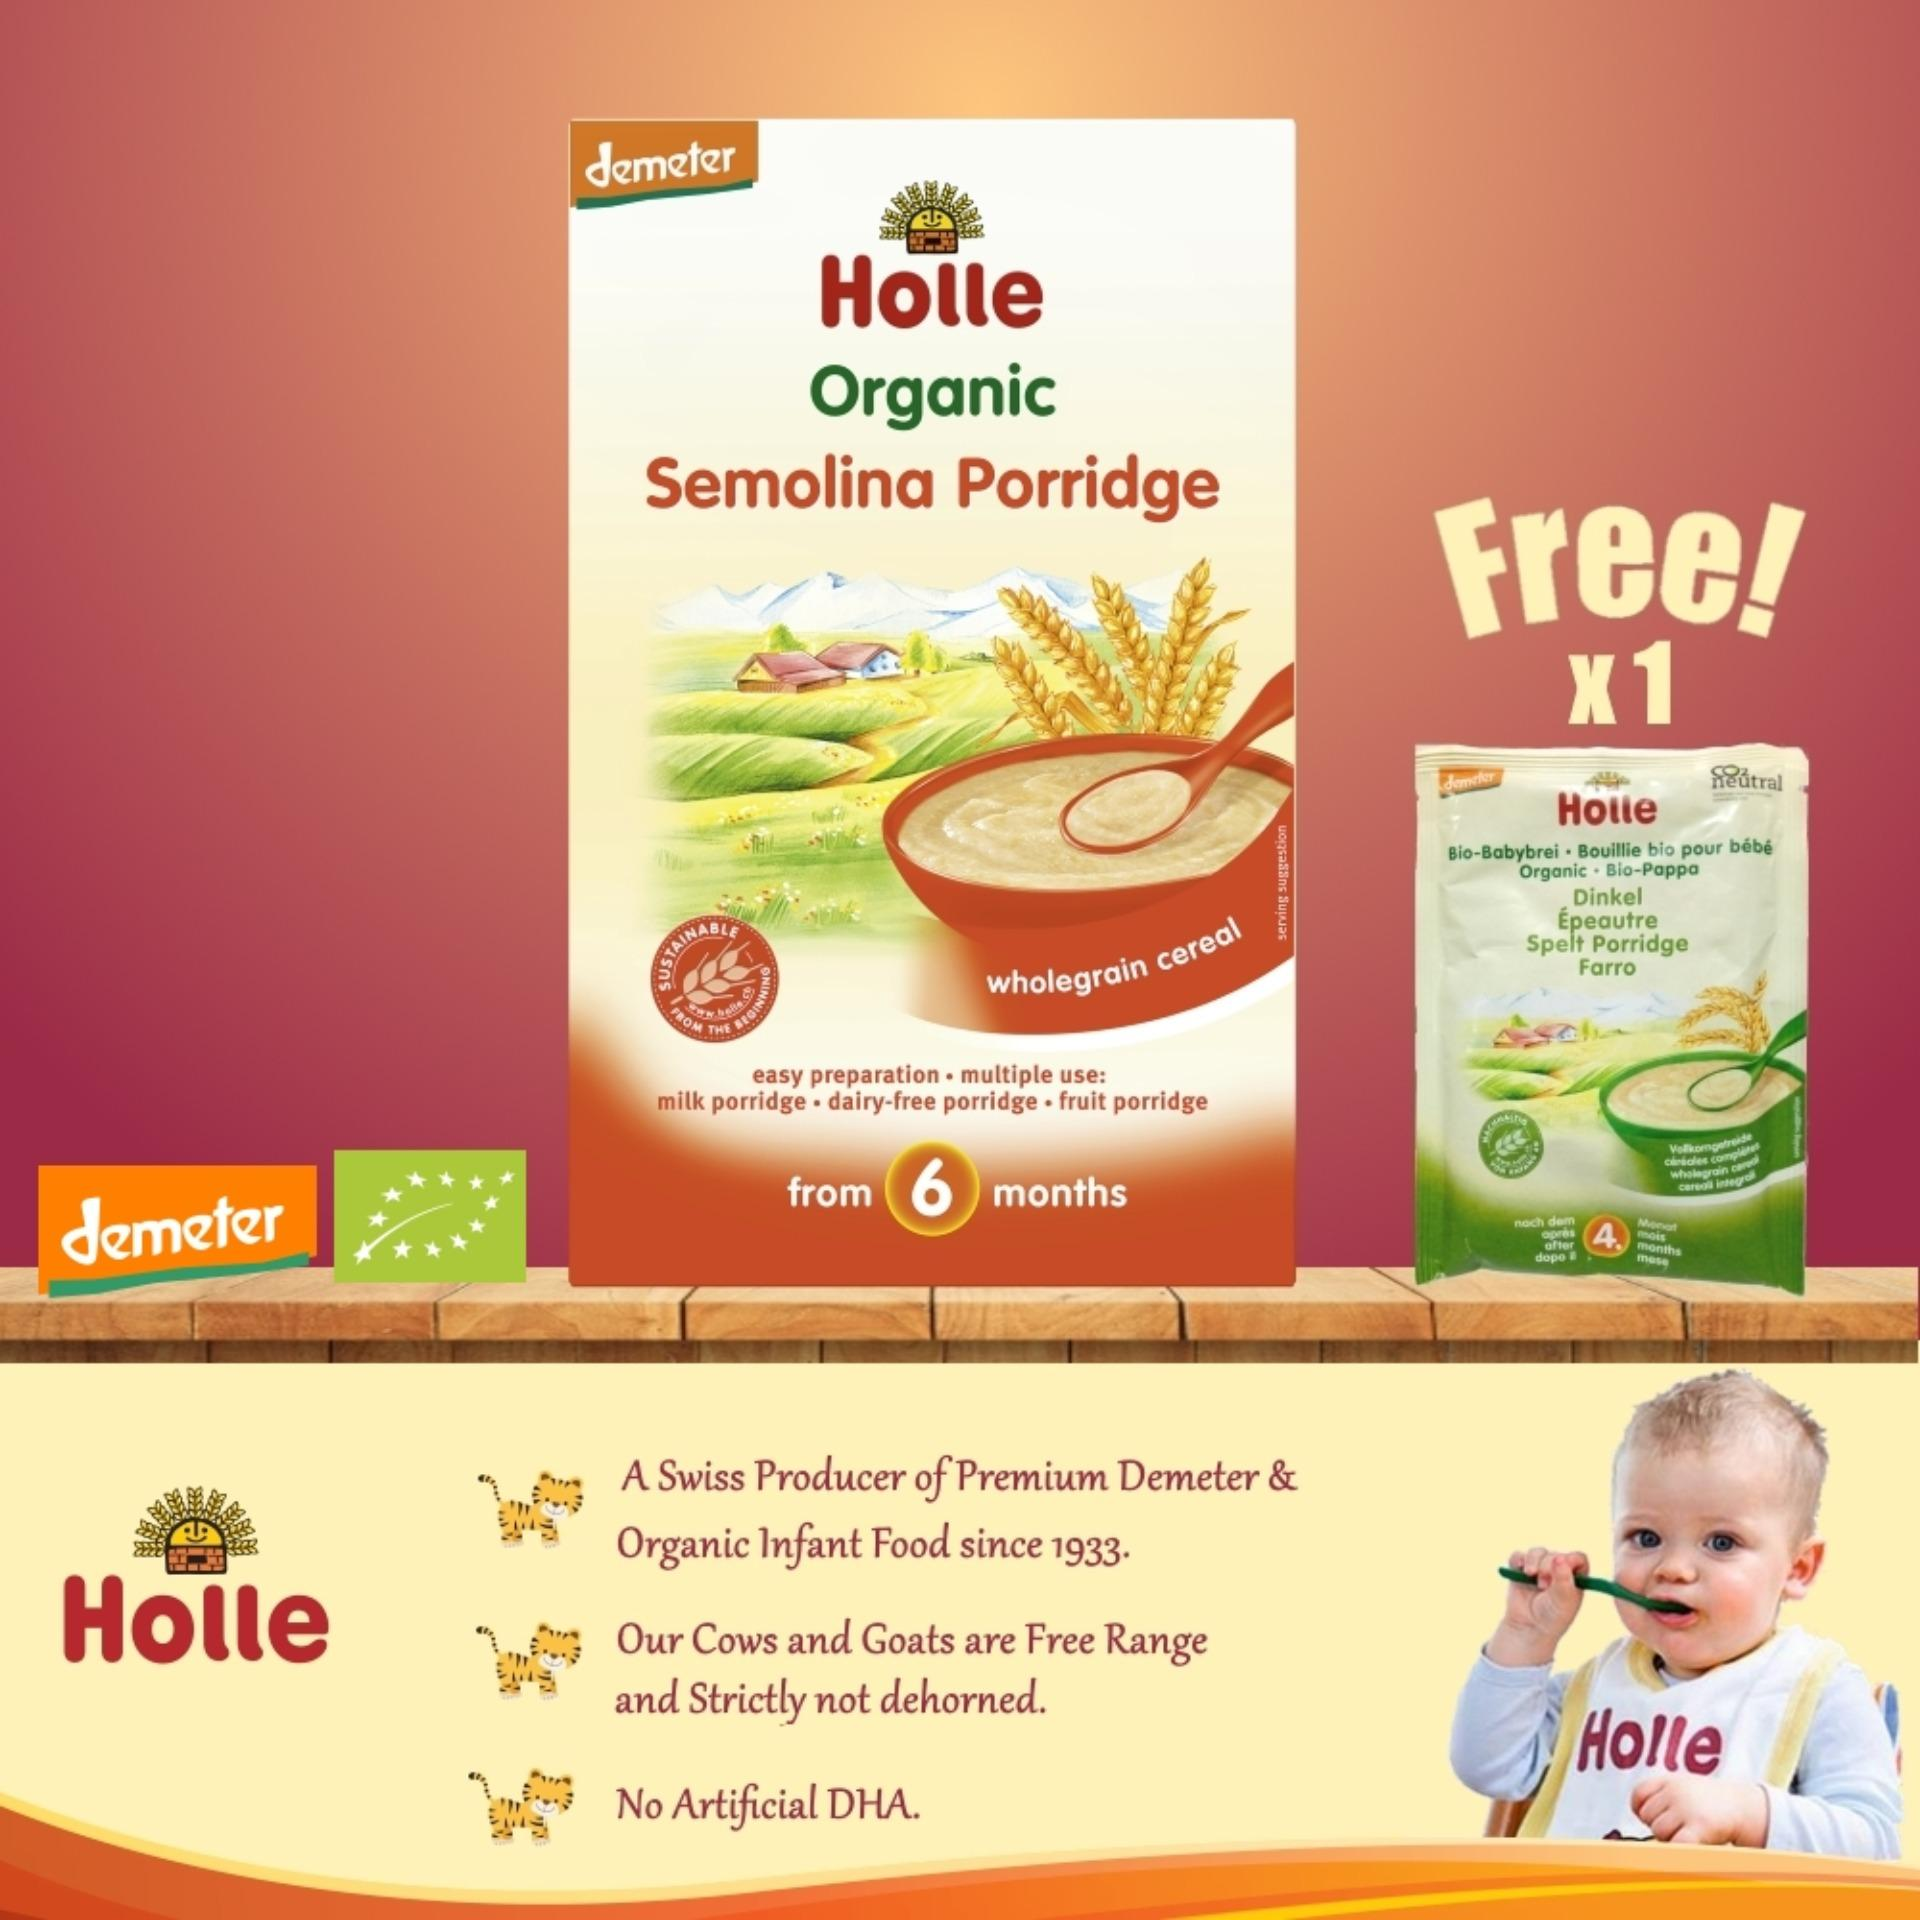 For Sale Expiry 01 Mar 2019 2 X Organic Semolina Porridge 250G